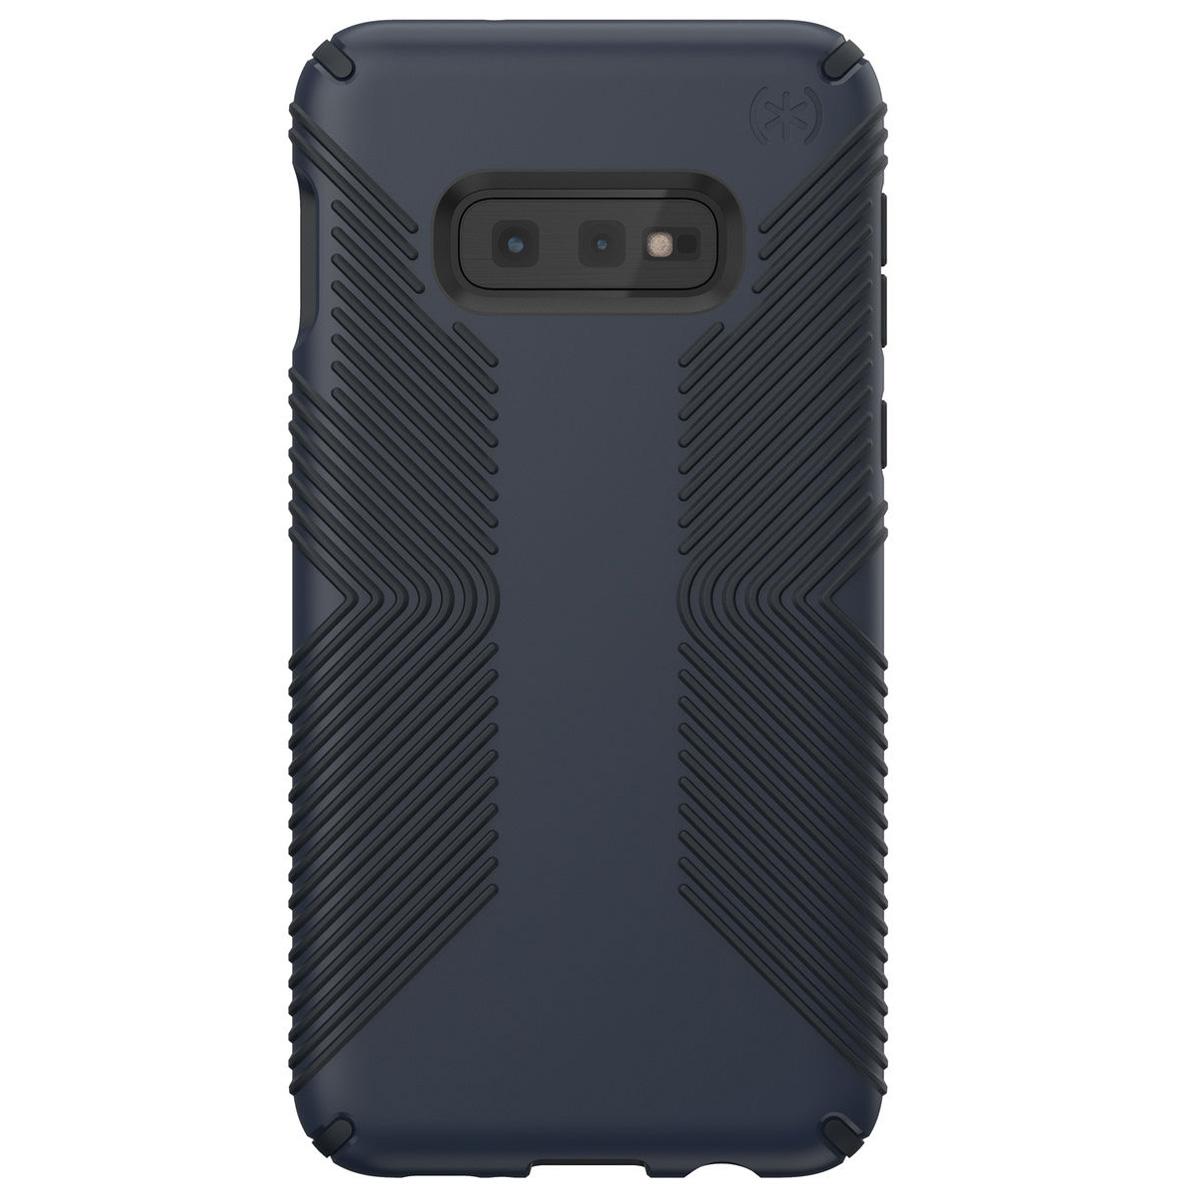 Speck Presidio Grip Samsung Galaxy S10e Case 1245786587